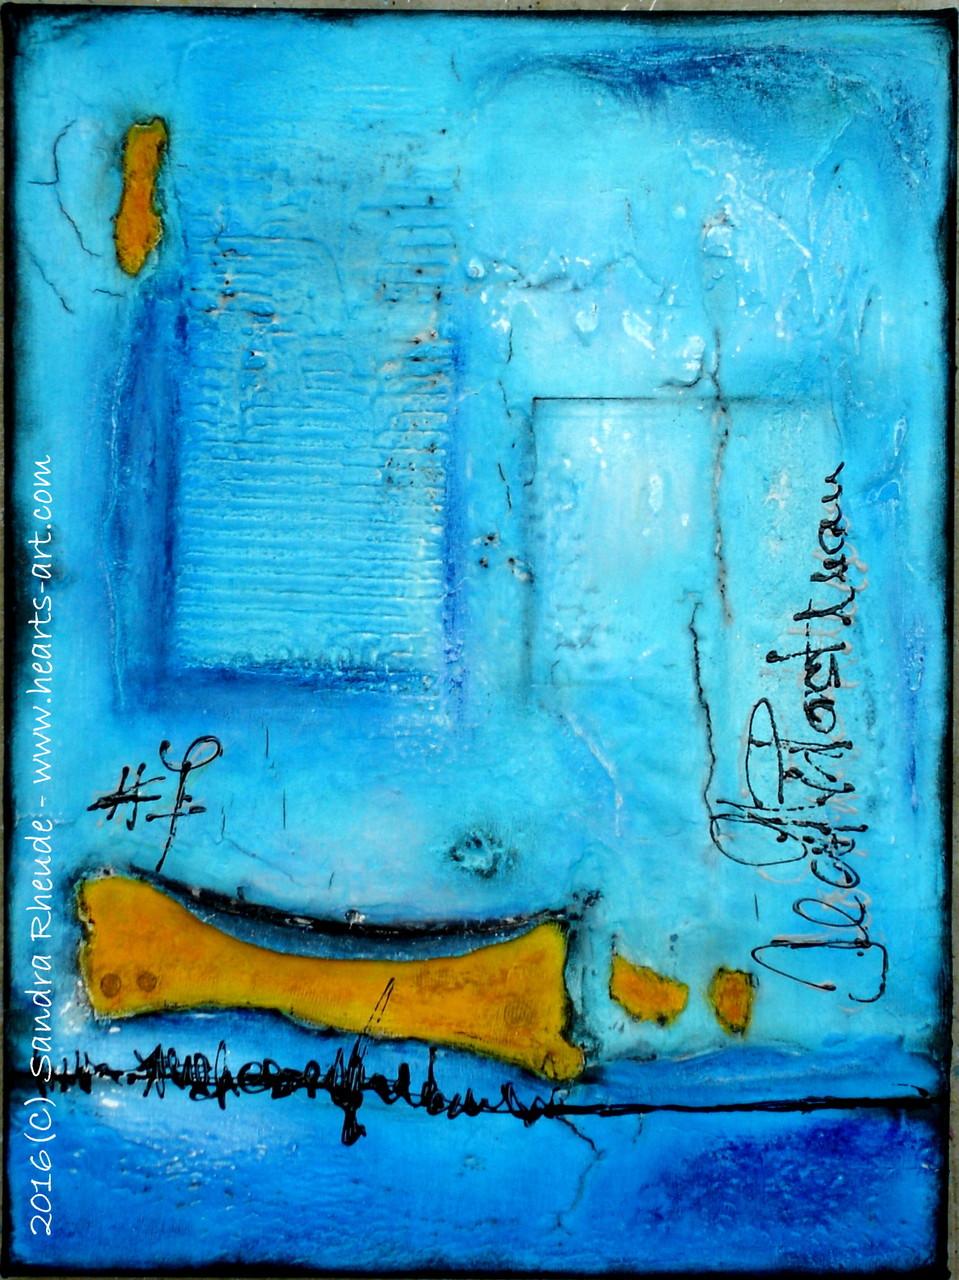 'Calle de Emilio Esteban' -  2016/12 - Acryl/MixedMedia auf Leinwand - 30 x 40 cm - € 220